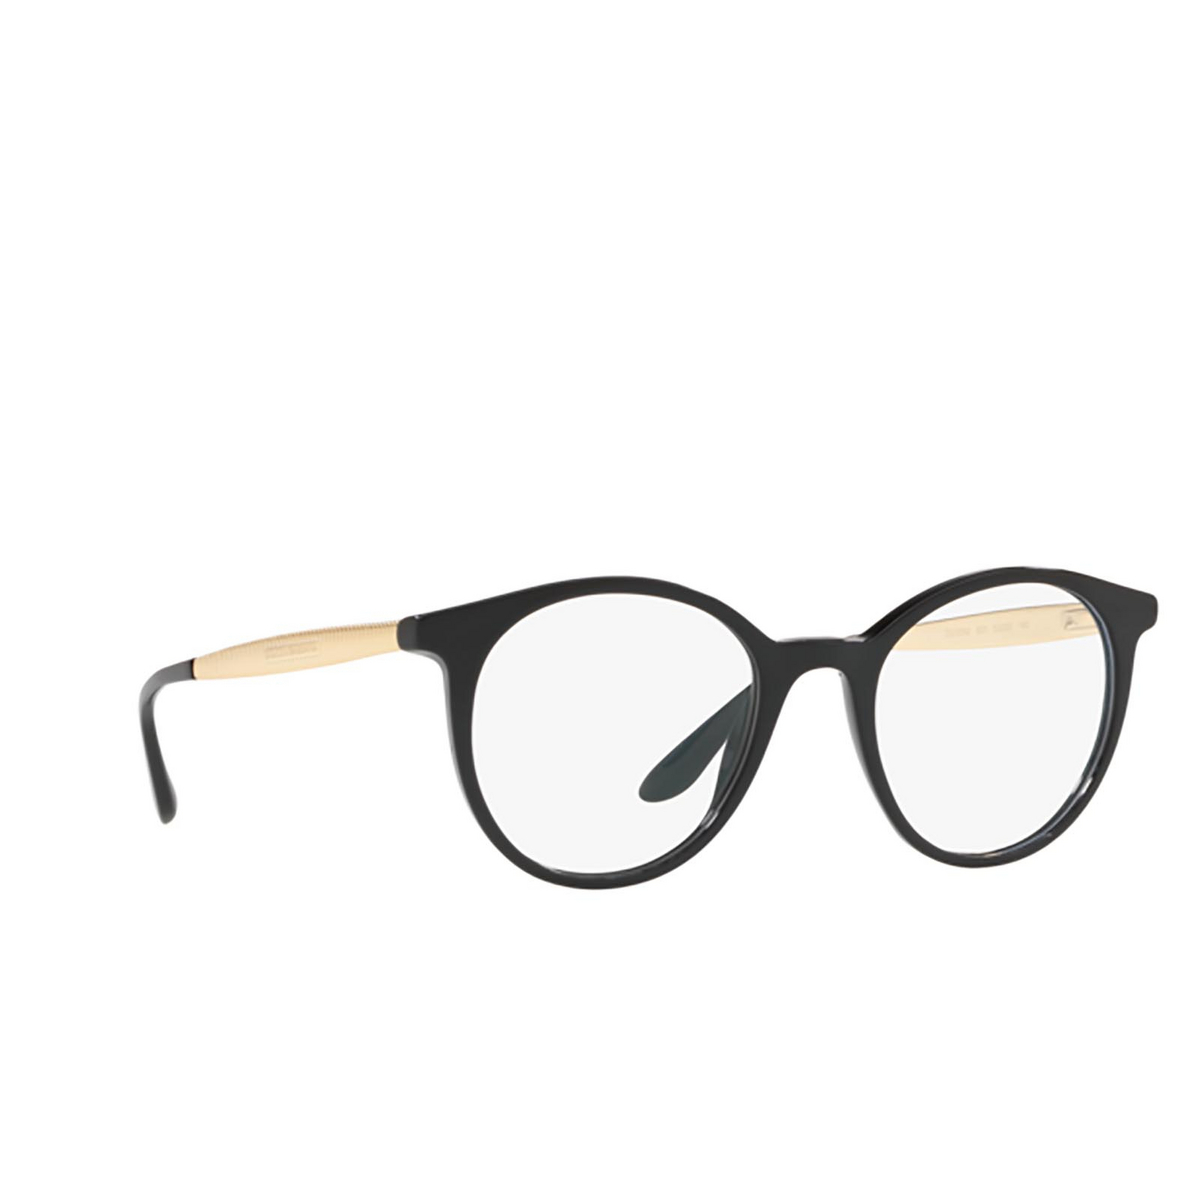 Dolce & Gabbana® Round Eyeglasses: DG3292 color 501 - three-quarters view.